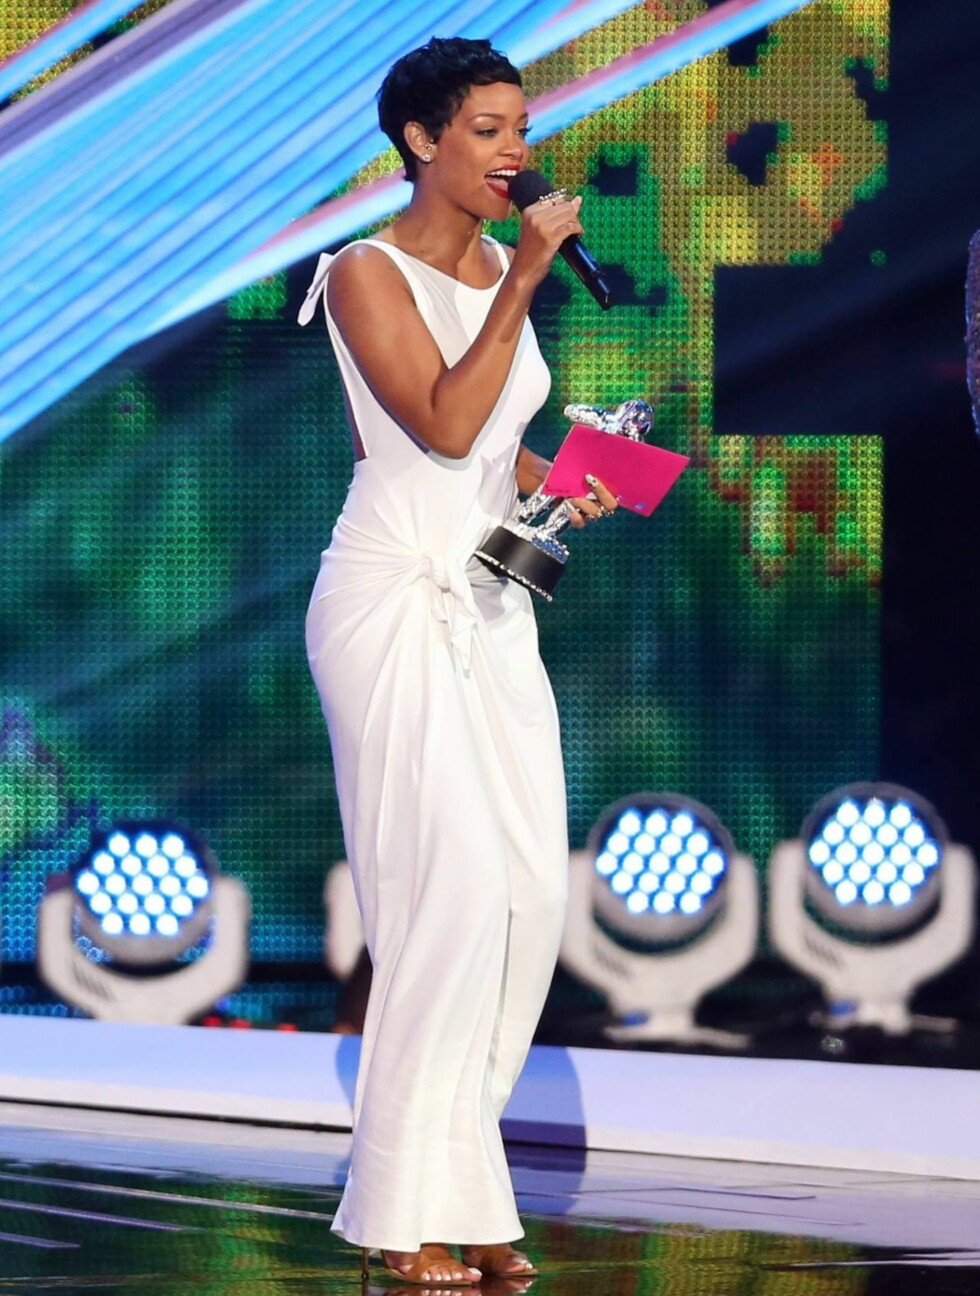 <strong>NATTENS DRONNING:</strong> Rihanna strålte i sin hvite kjole, og kunne også glede seg over prisen for årets beste video. Foto: All Over Press